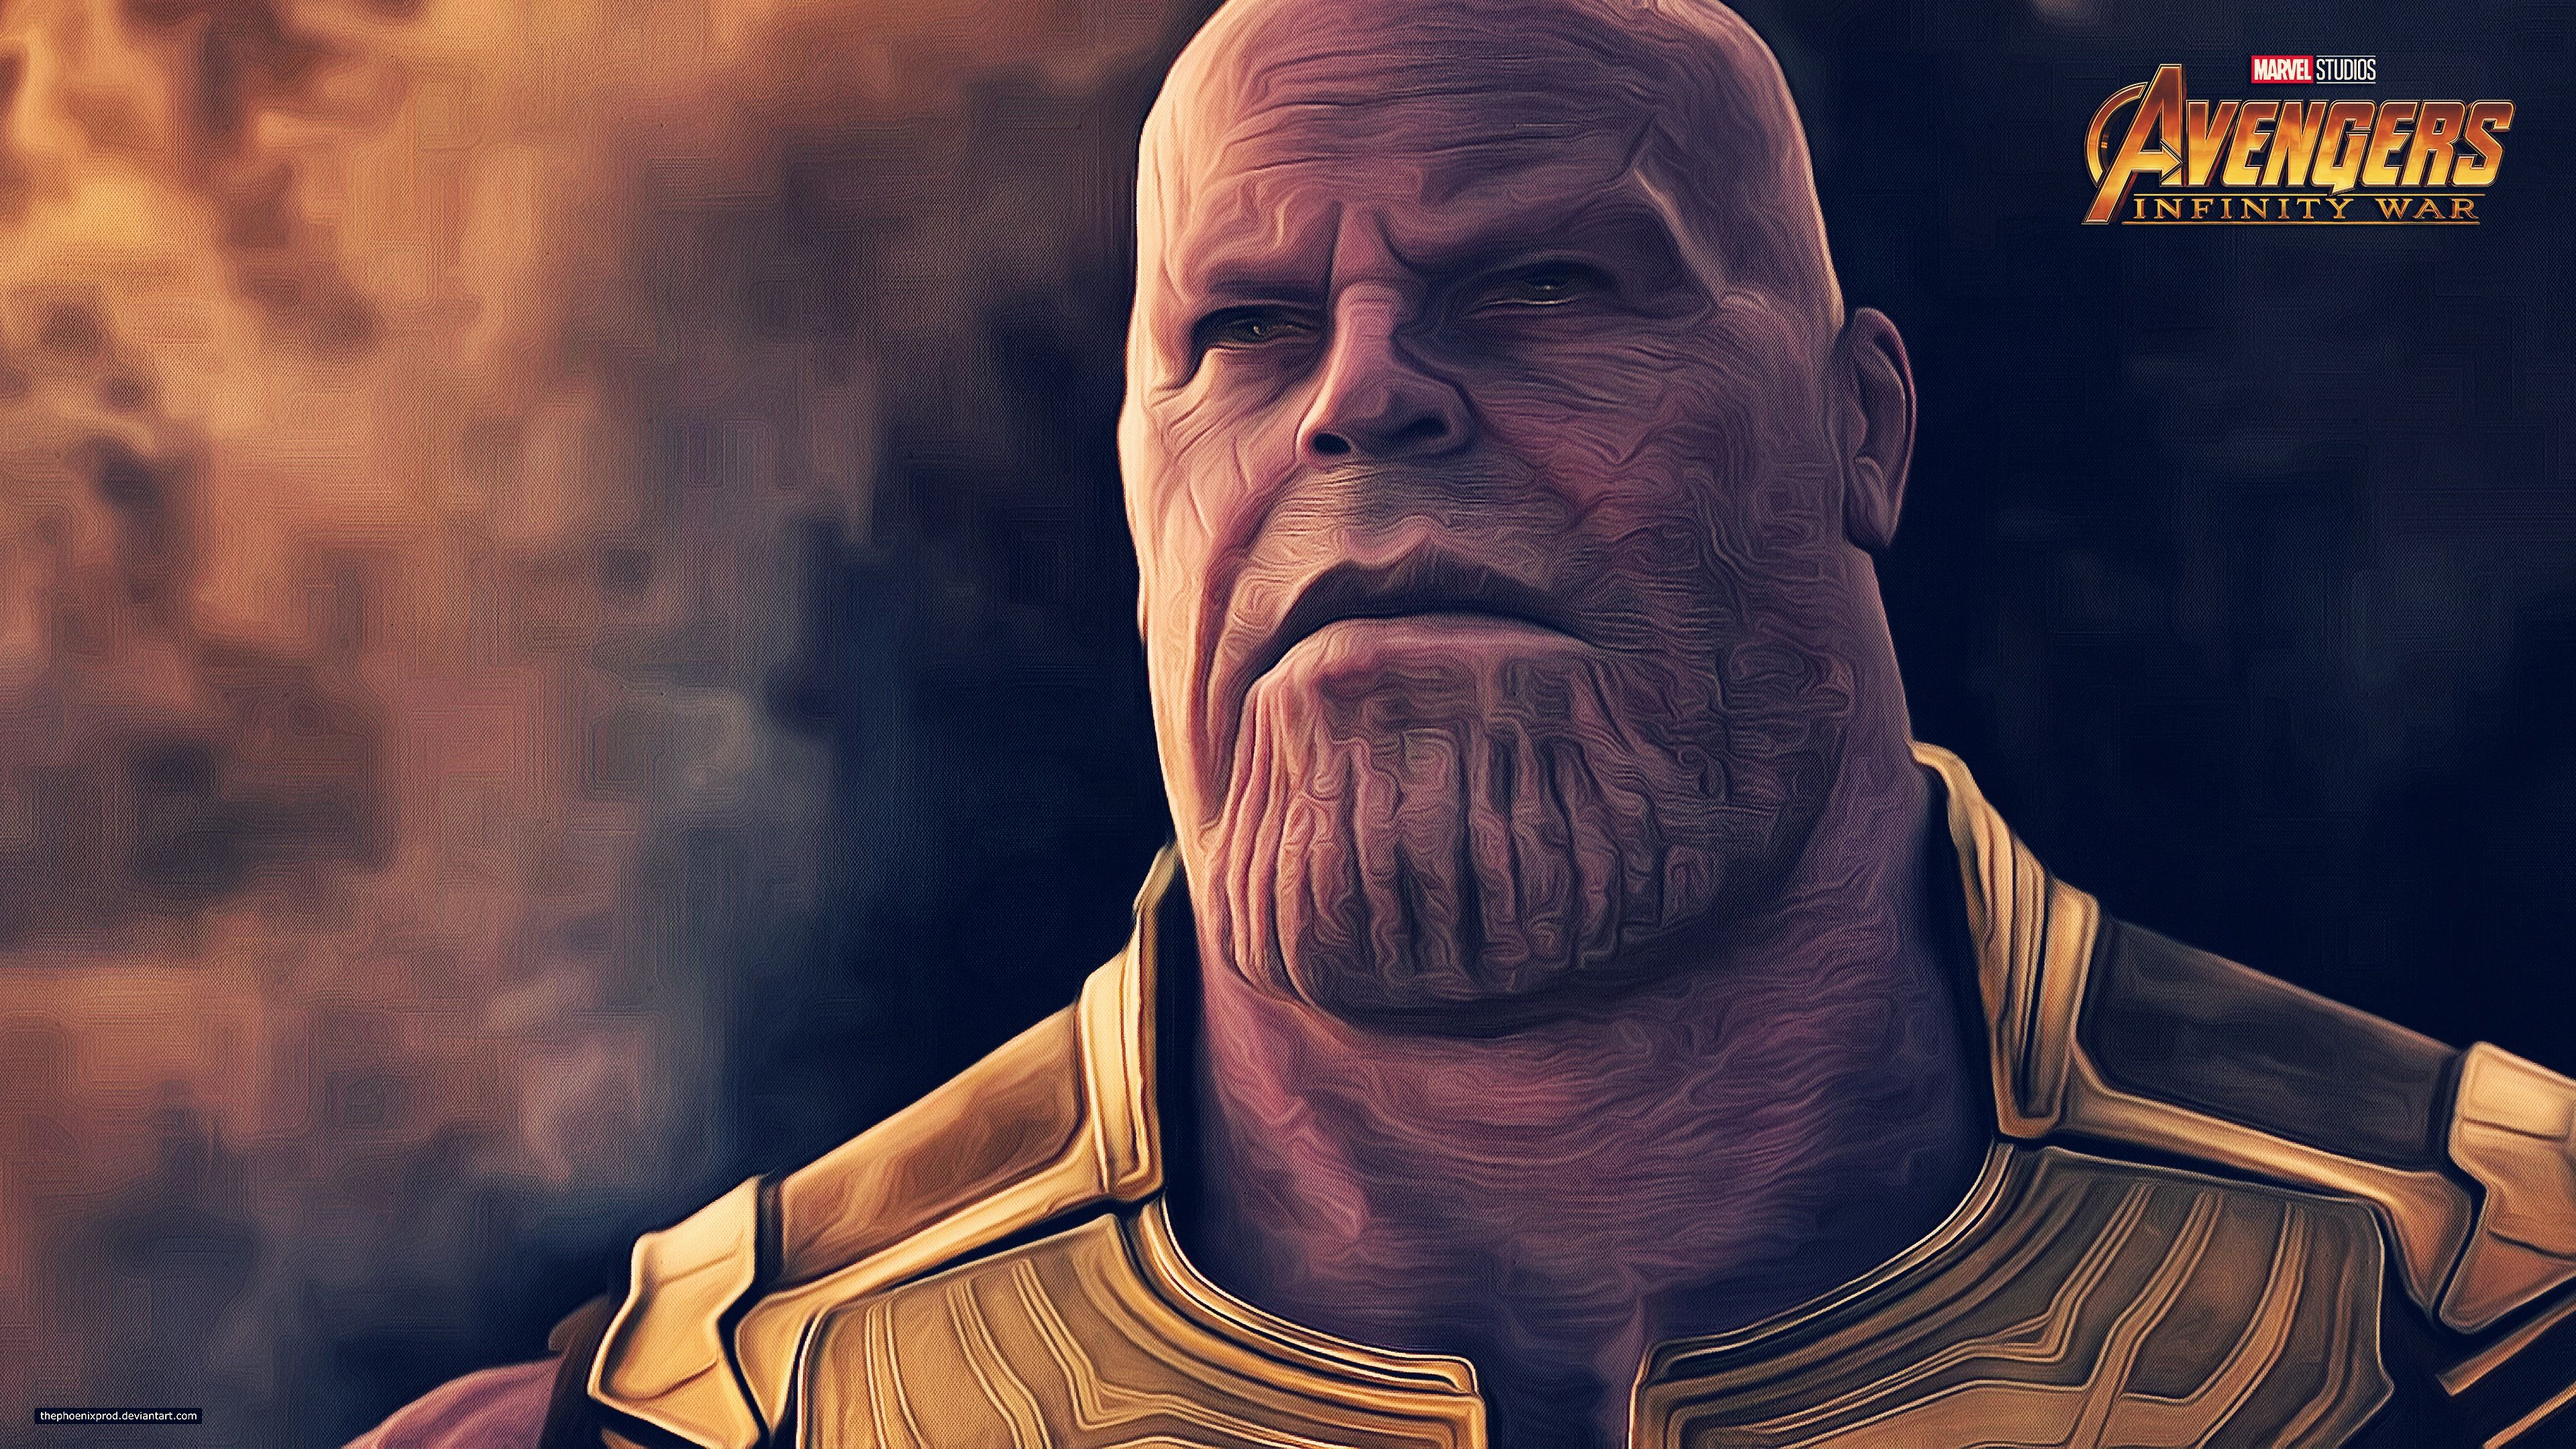 Thanos Avengers Infinity War 4k Thanos Avengers Infinity War Avengers Infinity War Avengers Marvel Infinity War